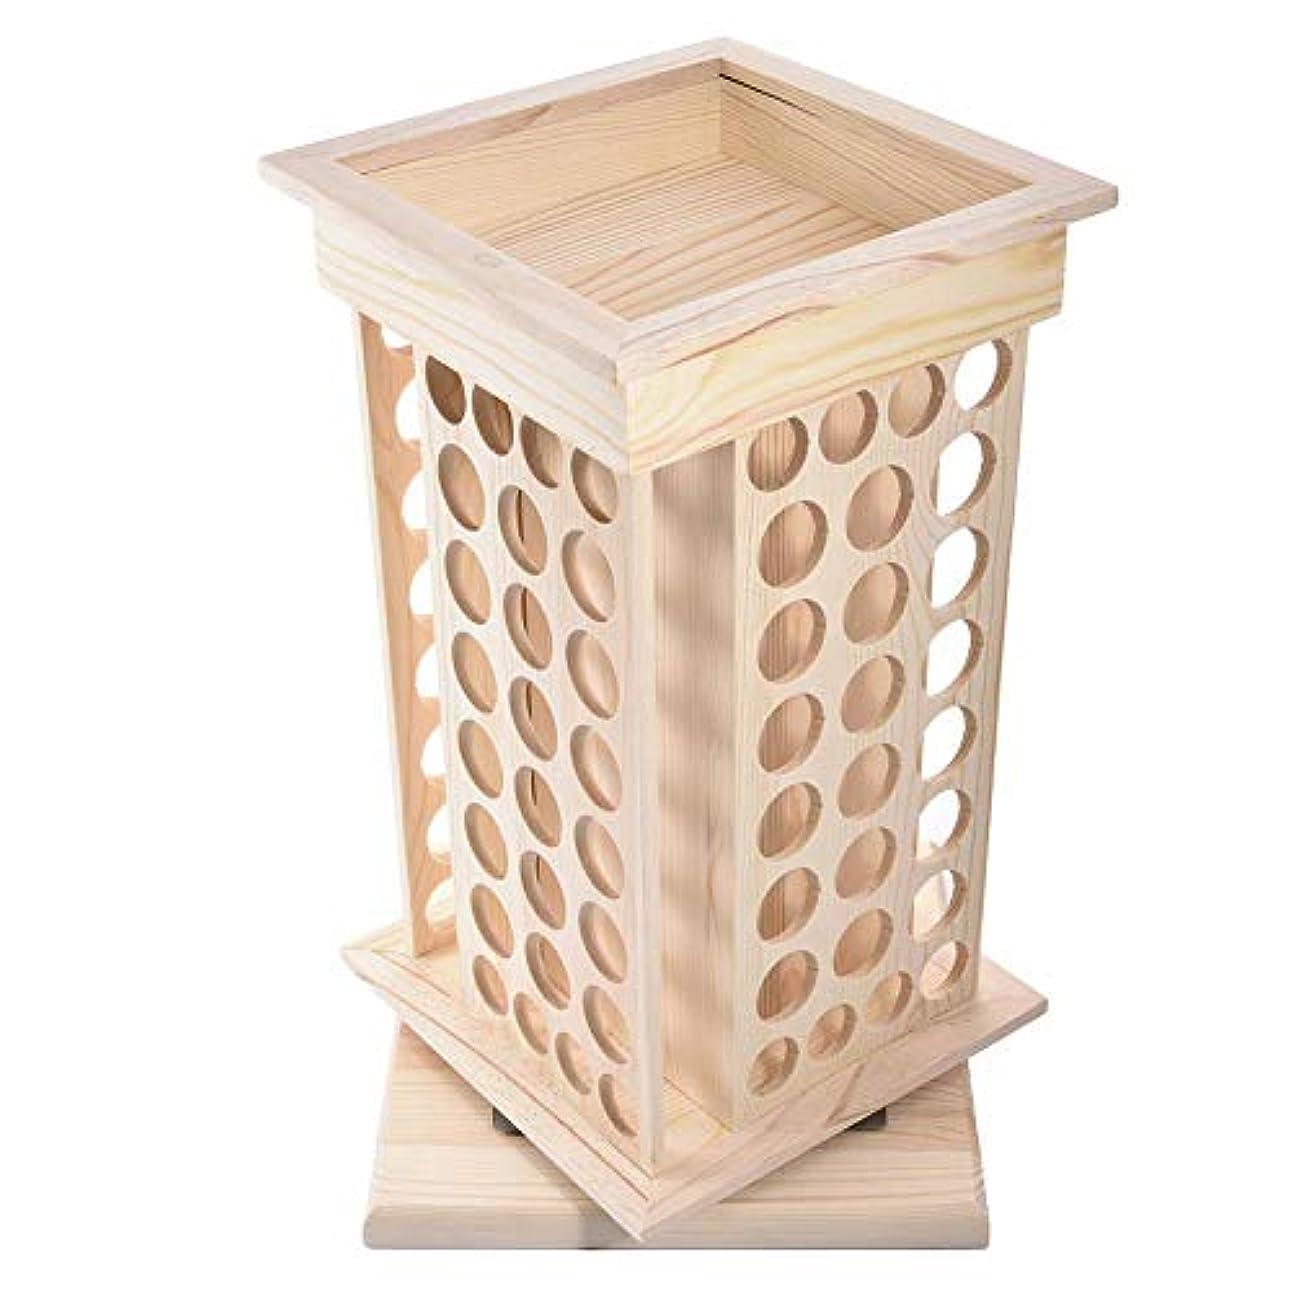 Pursue アロマオイルスタンド 精油収納 香水展示スタンド エッセンシャルオイル収納 木製 104本用